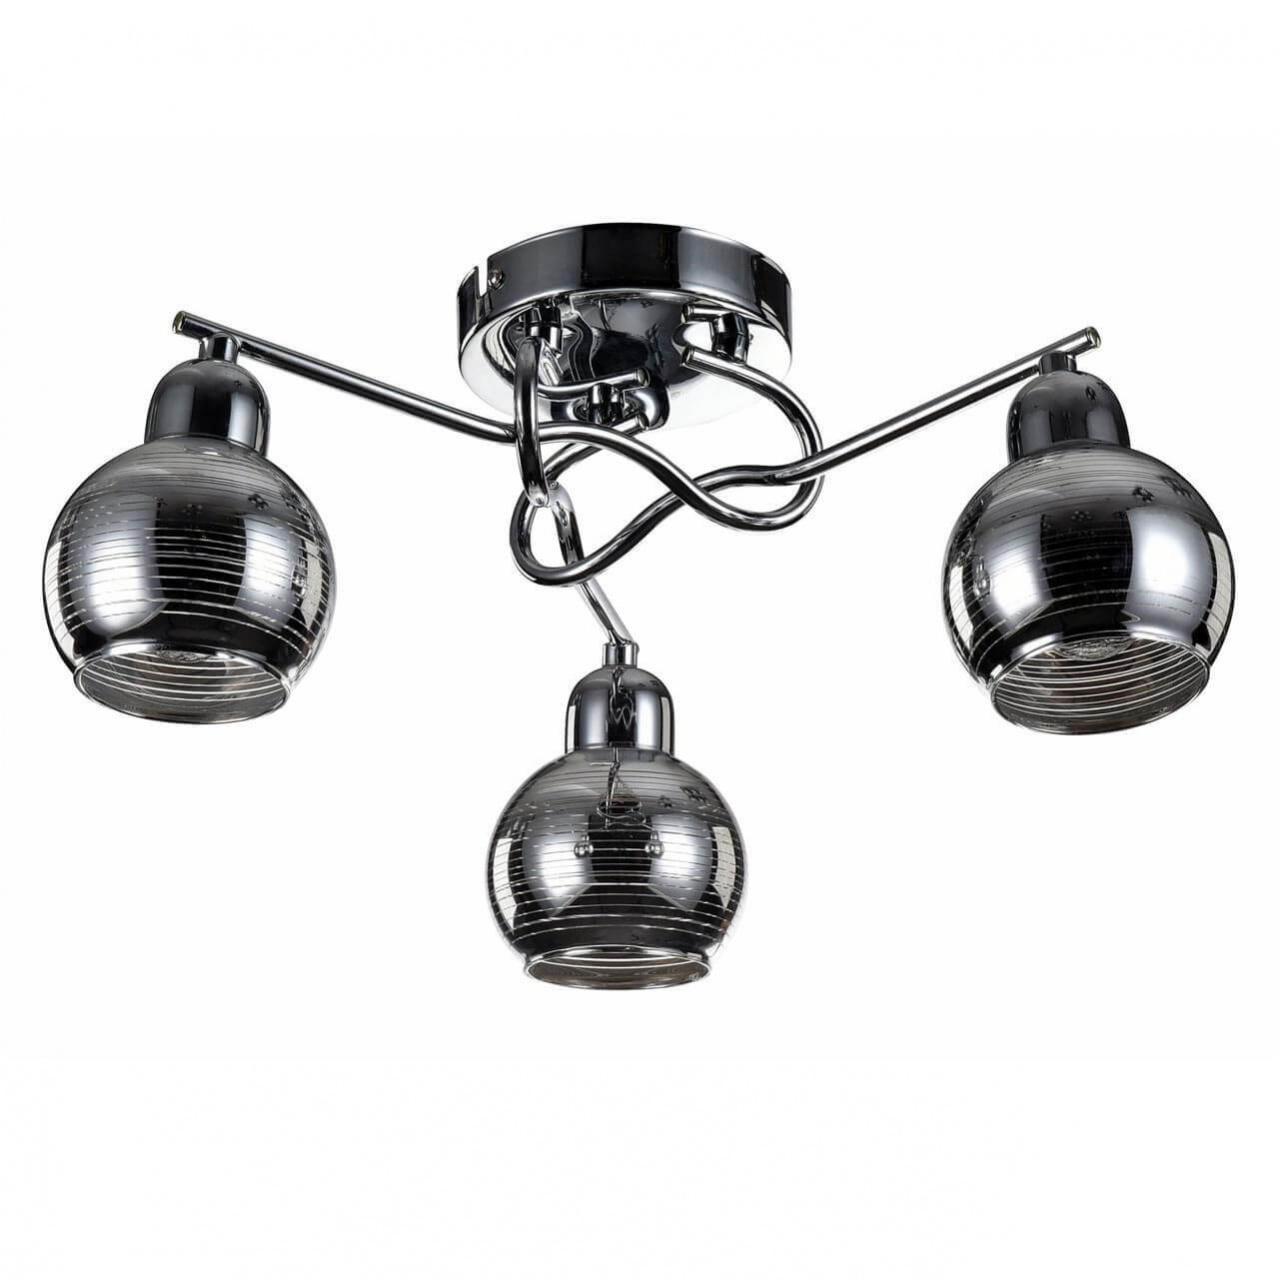 цена на Люстра Freya FR5102-CL-03-CH Cosmo